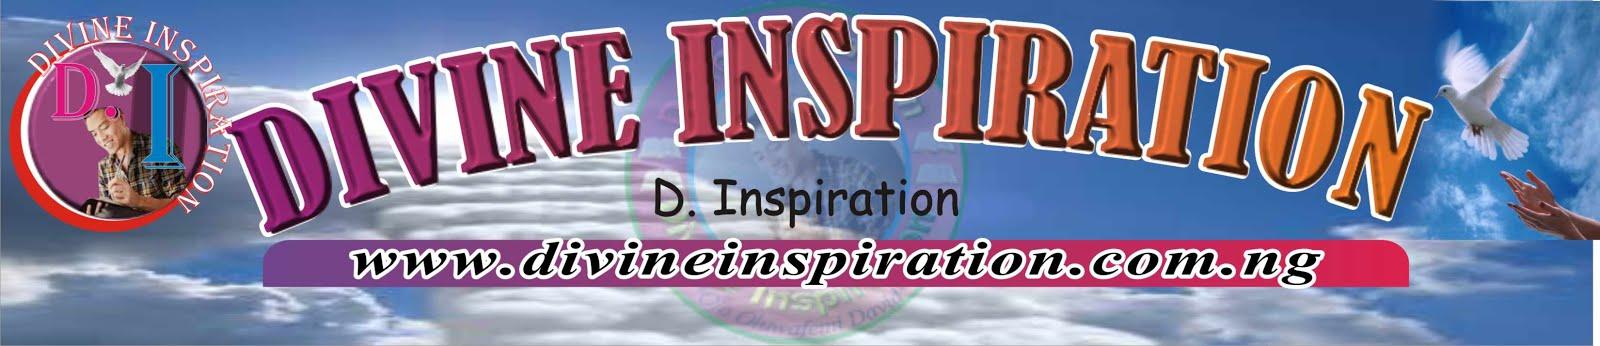 D. Inspiration